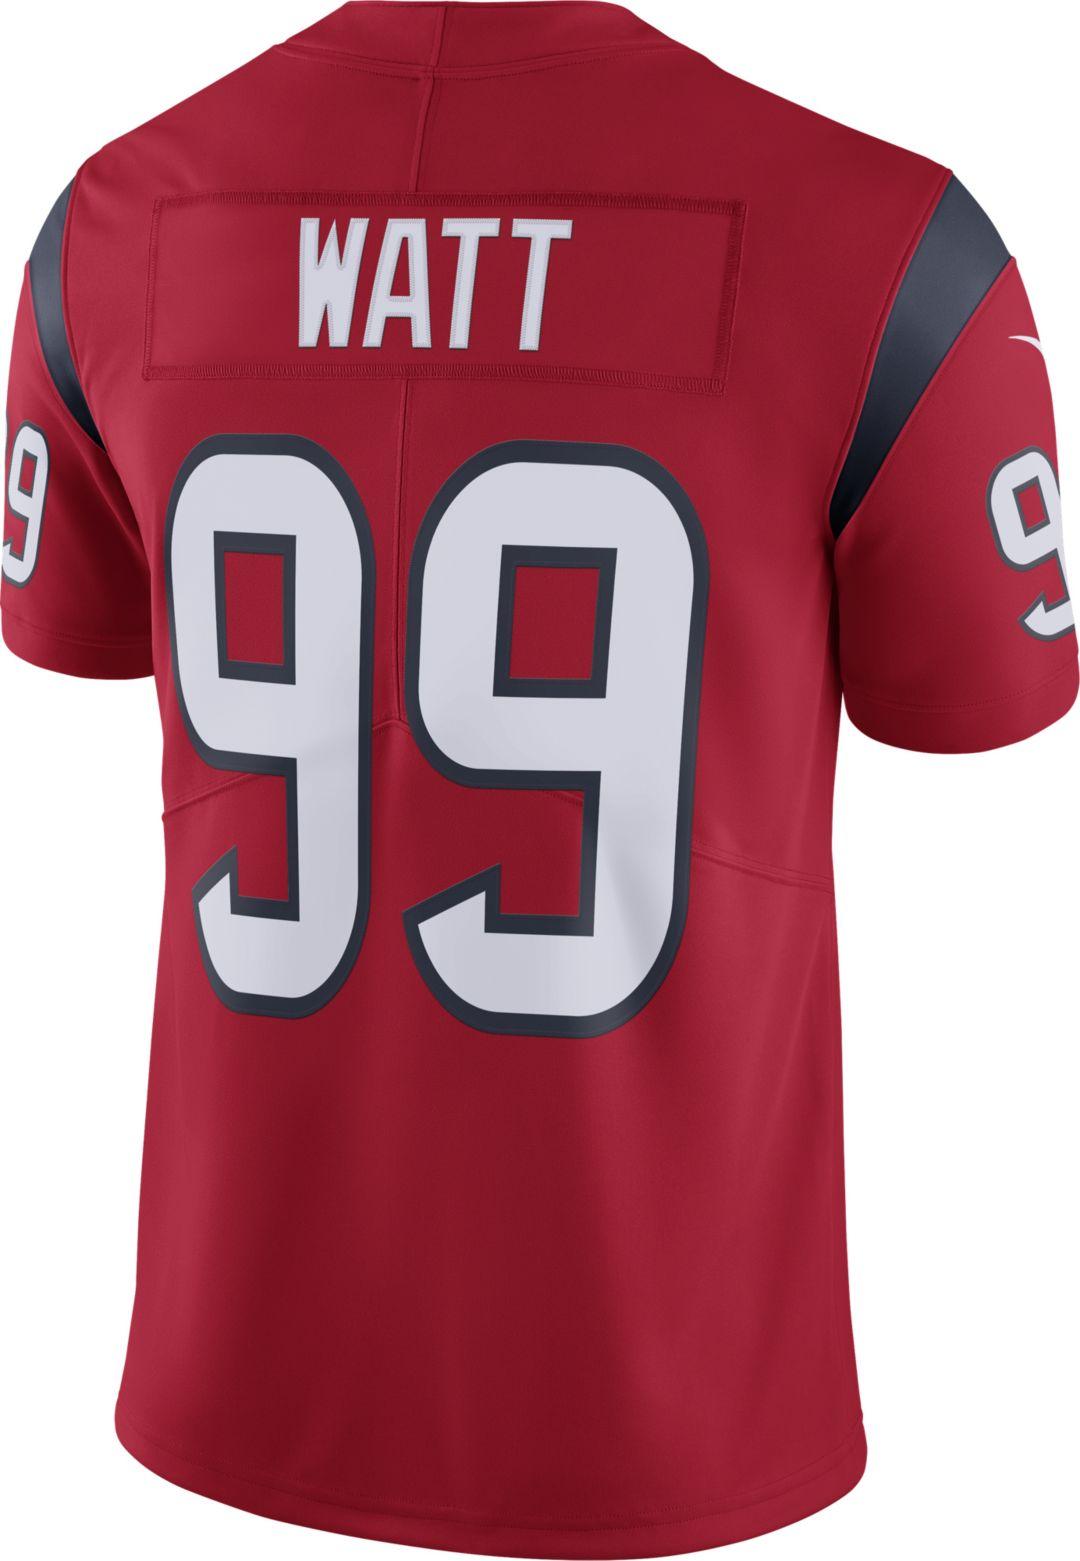 half off e09a4 74788 Nike Men's Alternate Limited Jersey Houston Texans J.J. Watt #99